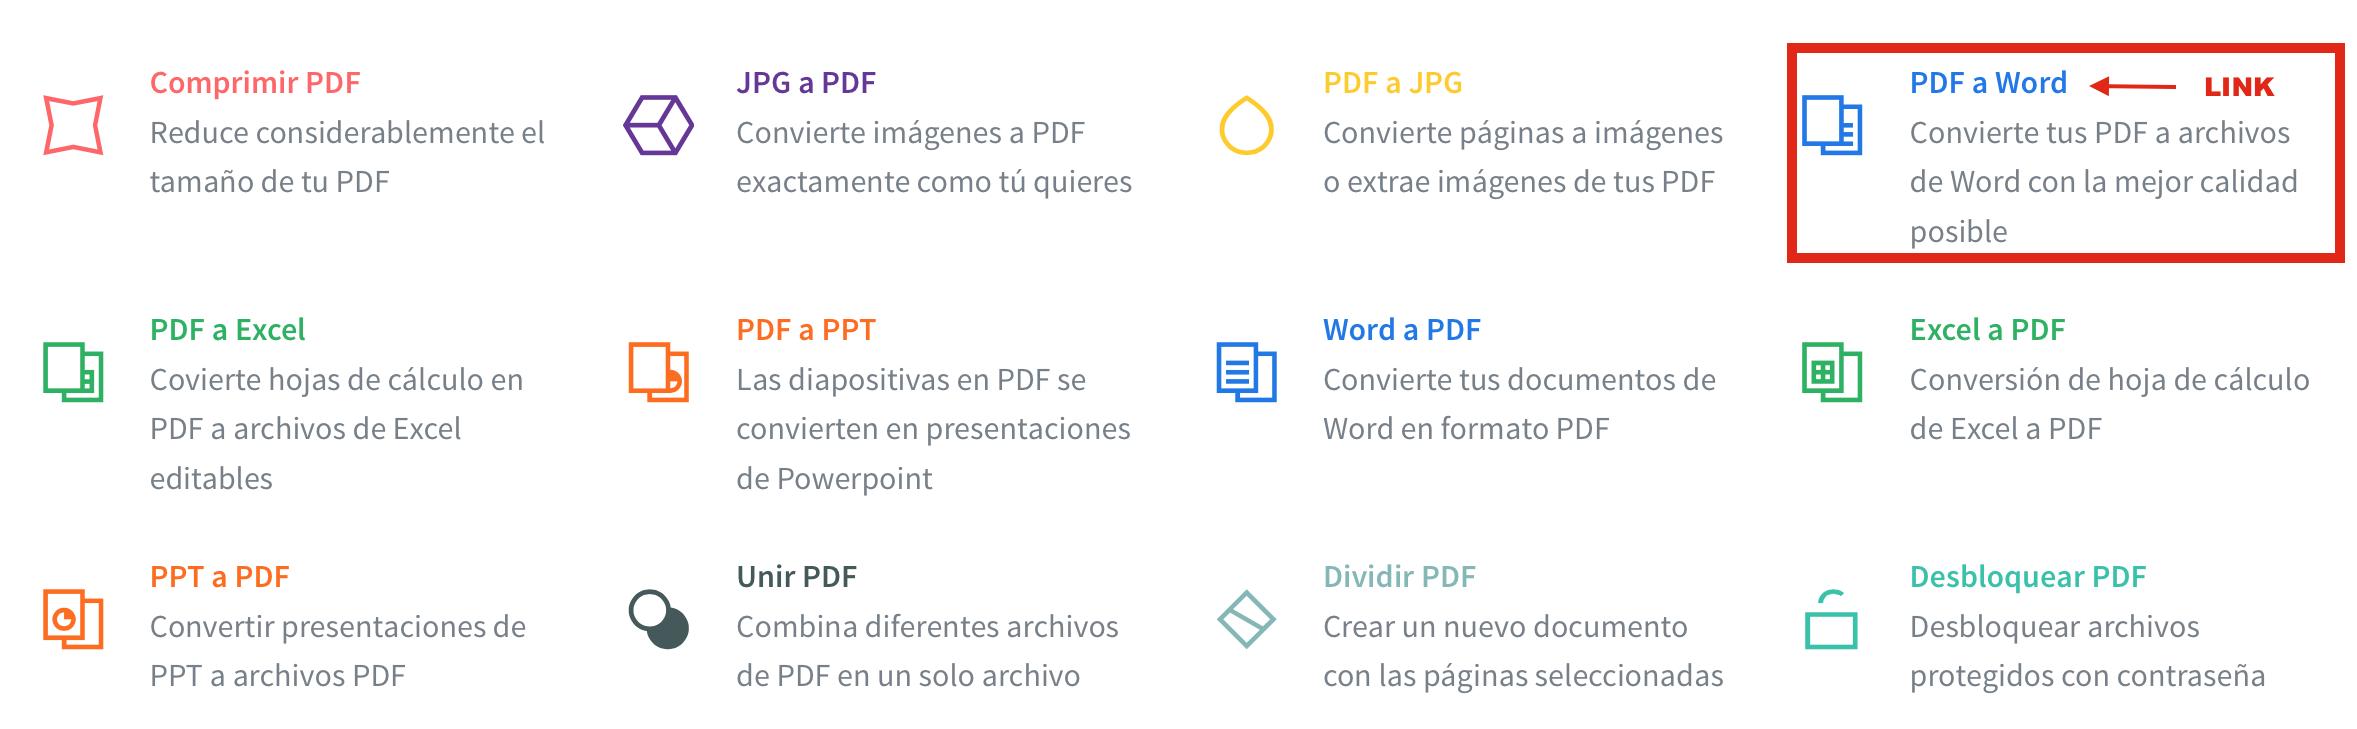 convertir un documento pdf a word gratis